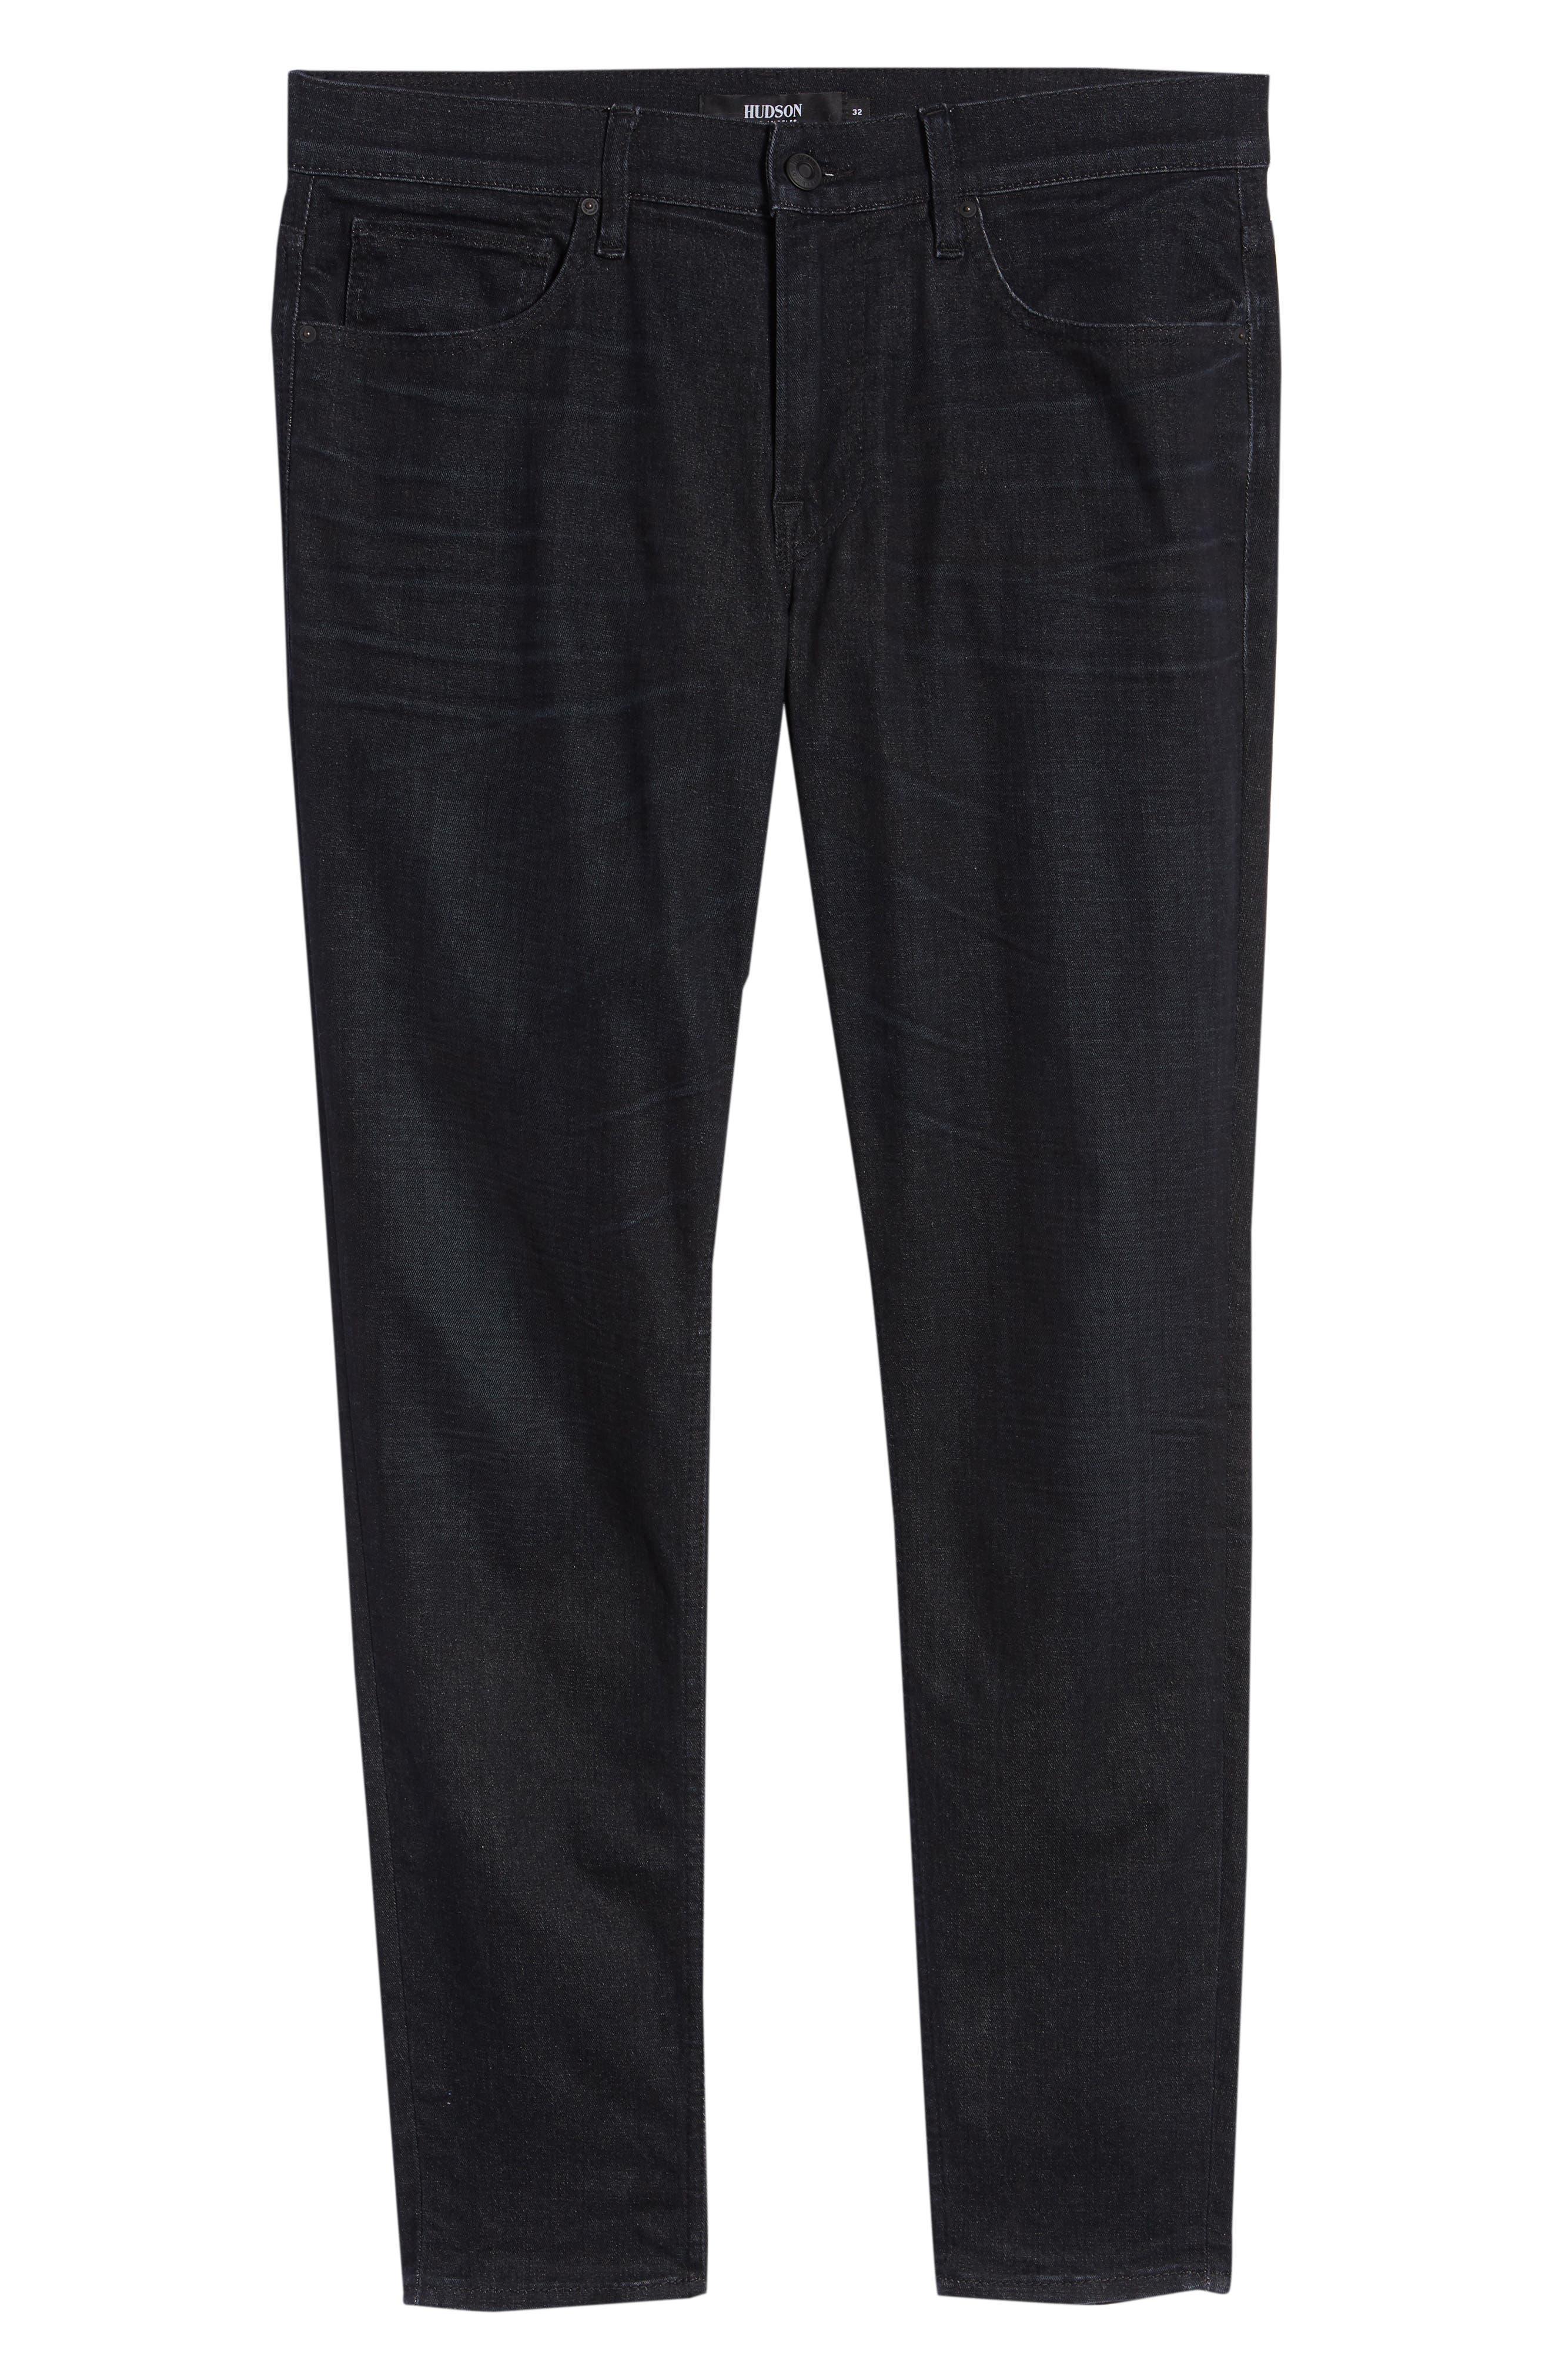 Zack Skinny Fit Jeans,                             Alternate thumbnail 6, color,                             001